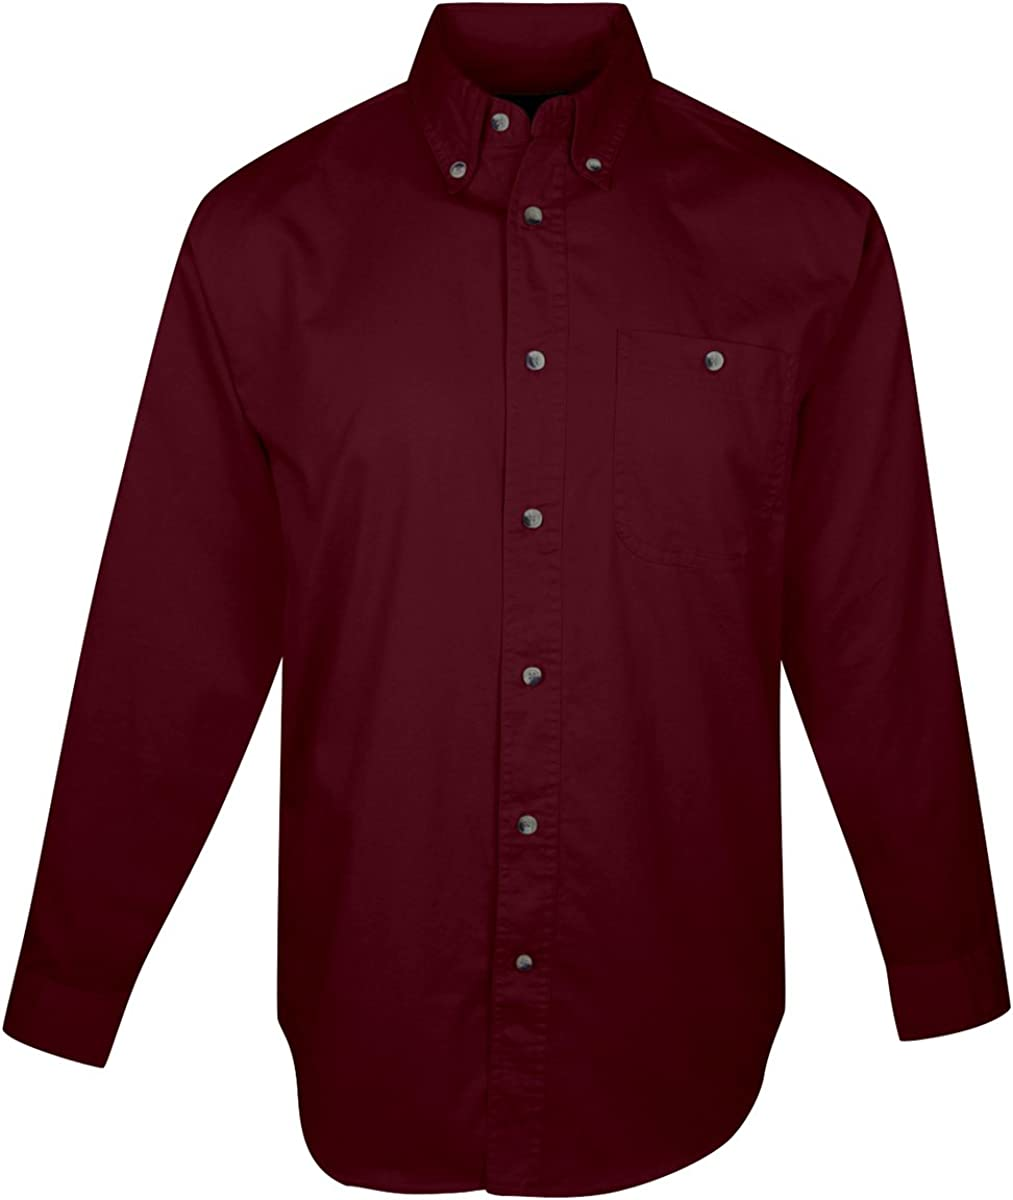 Tri-Mountain Big and Tall 6 oz. Cotton Long Sleeve Twill Shirt Dark Maroon